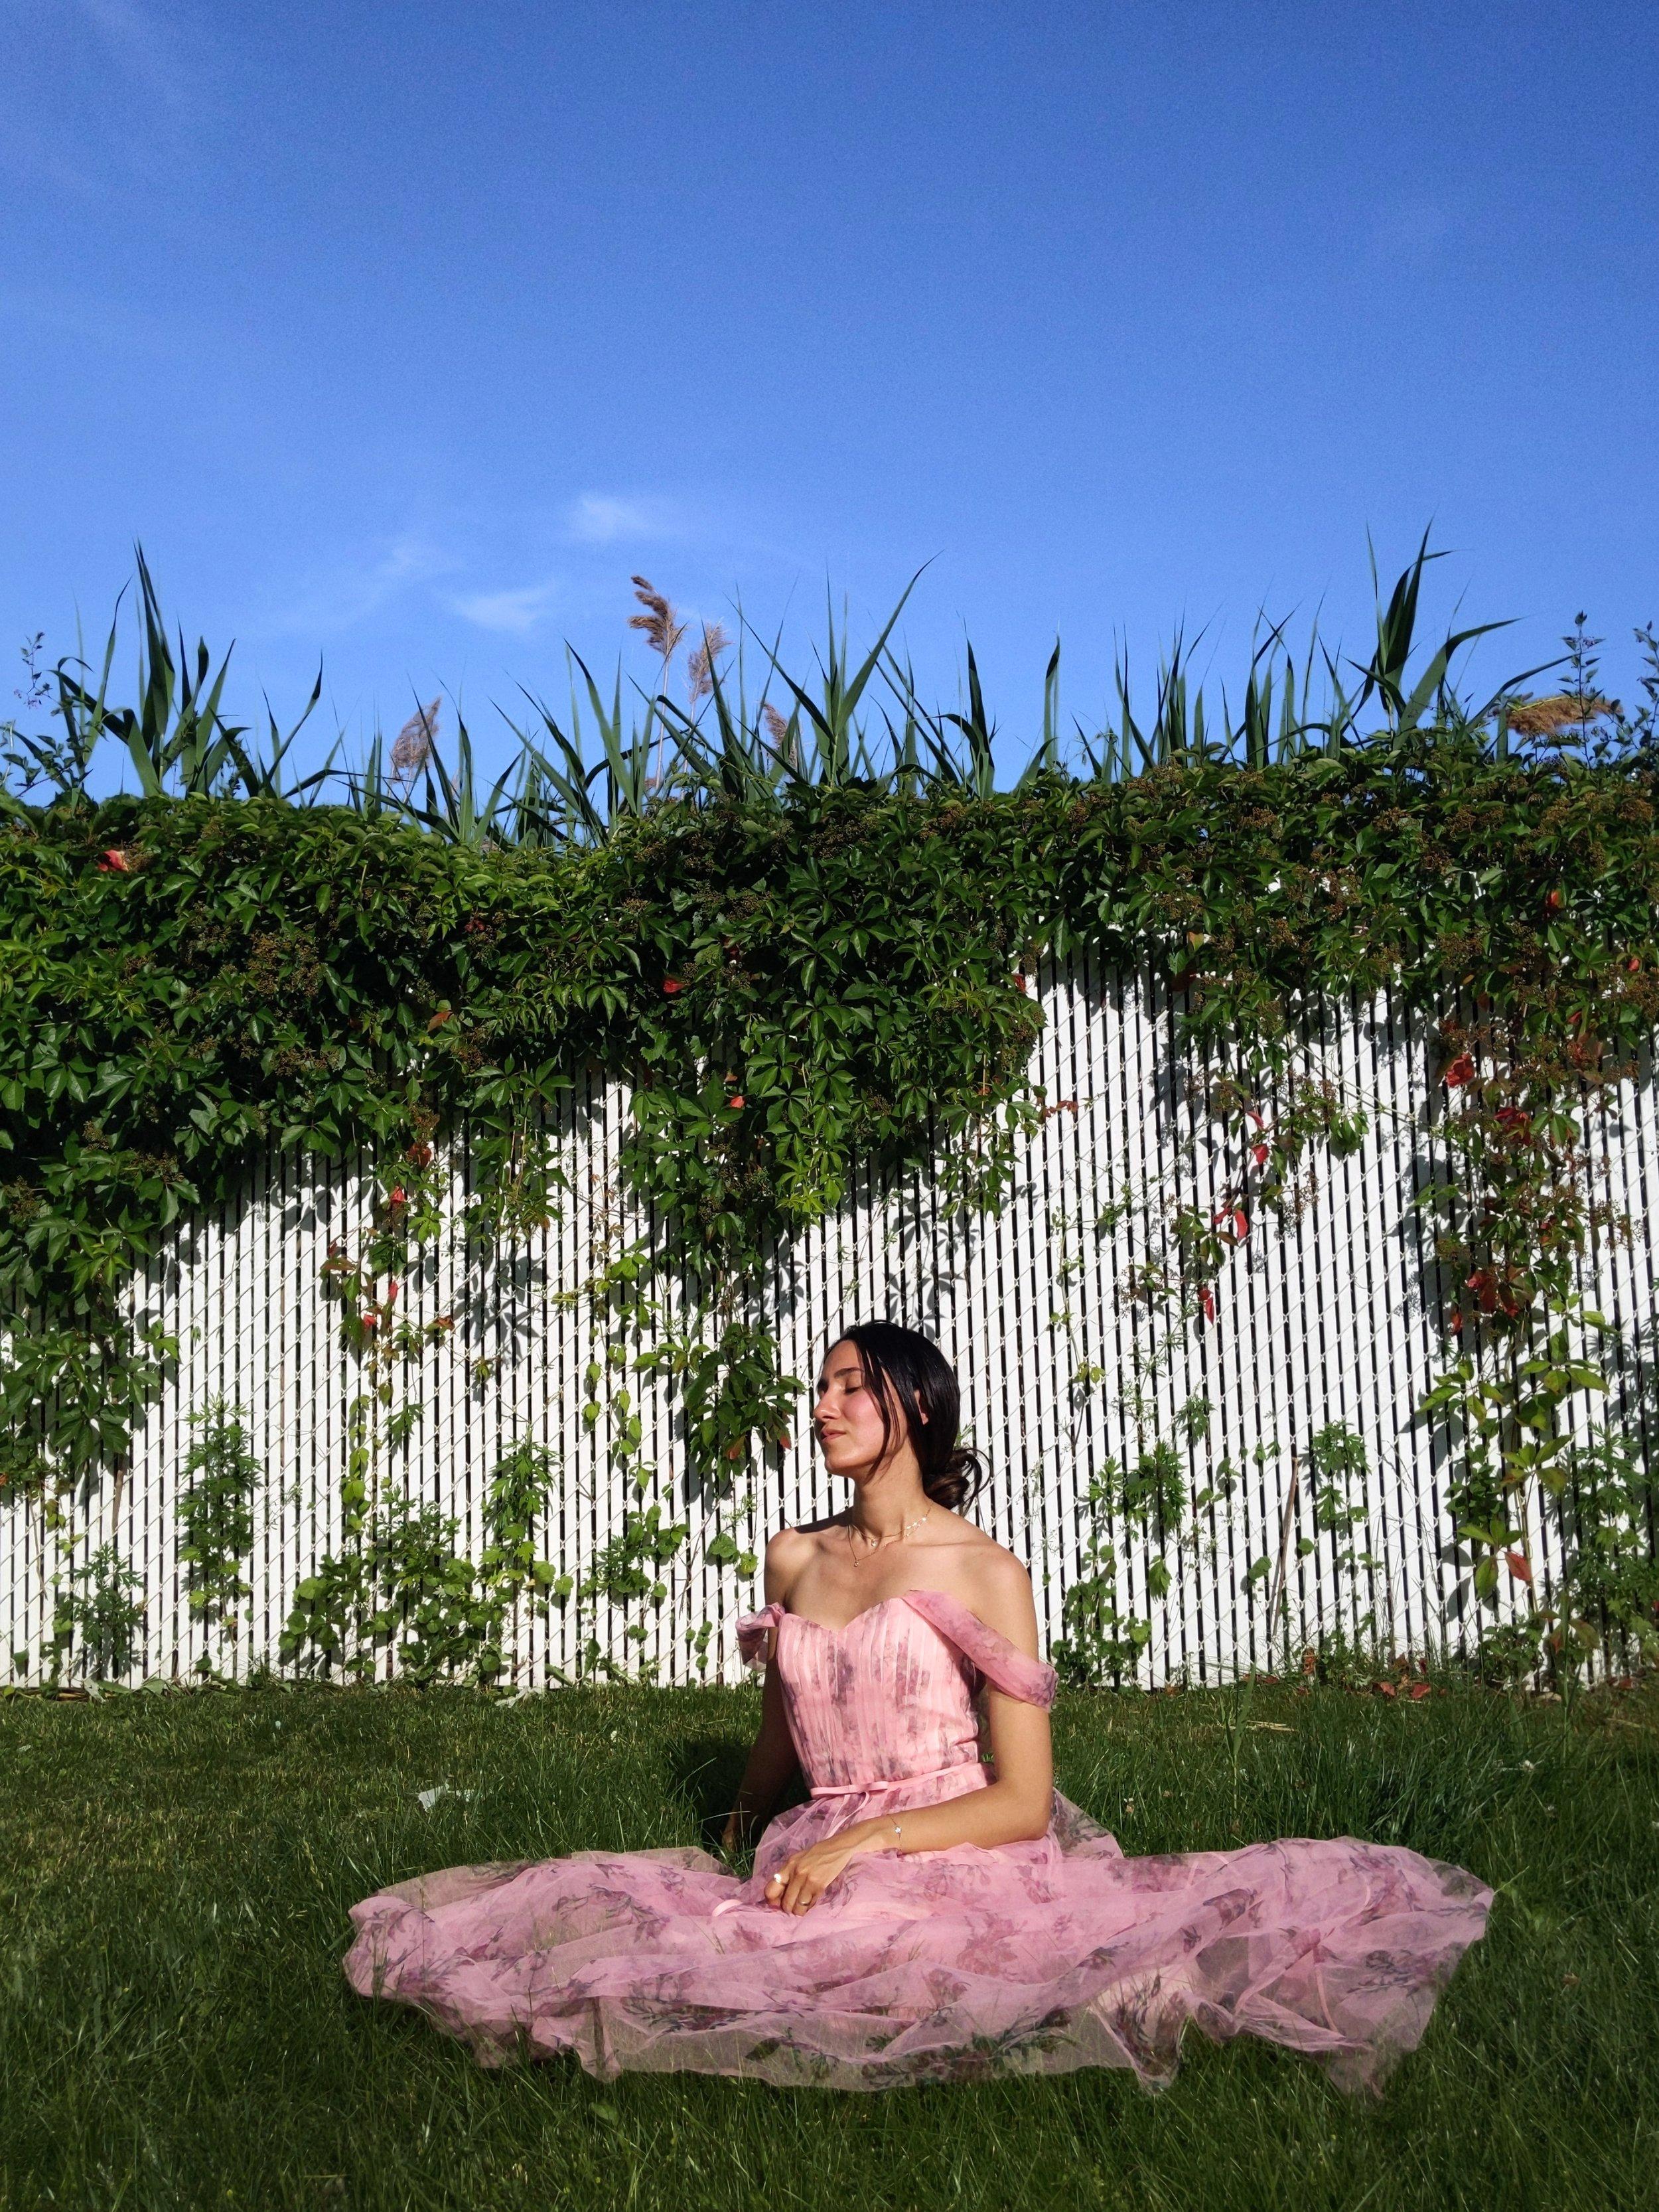 Wearing: Marchesa Notte  dress